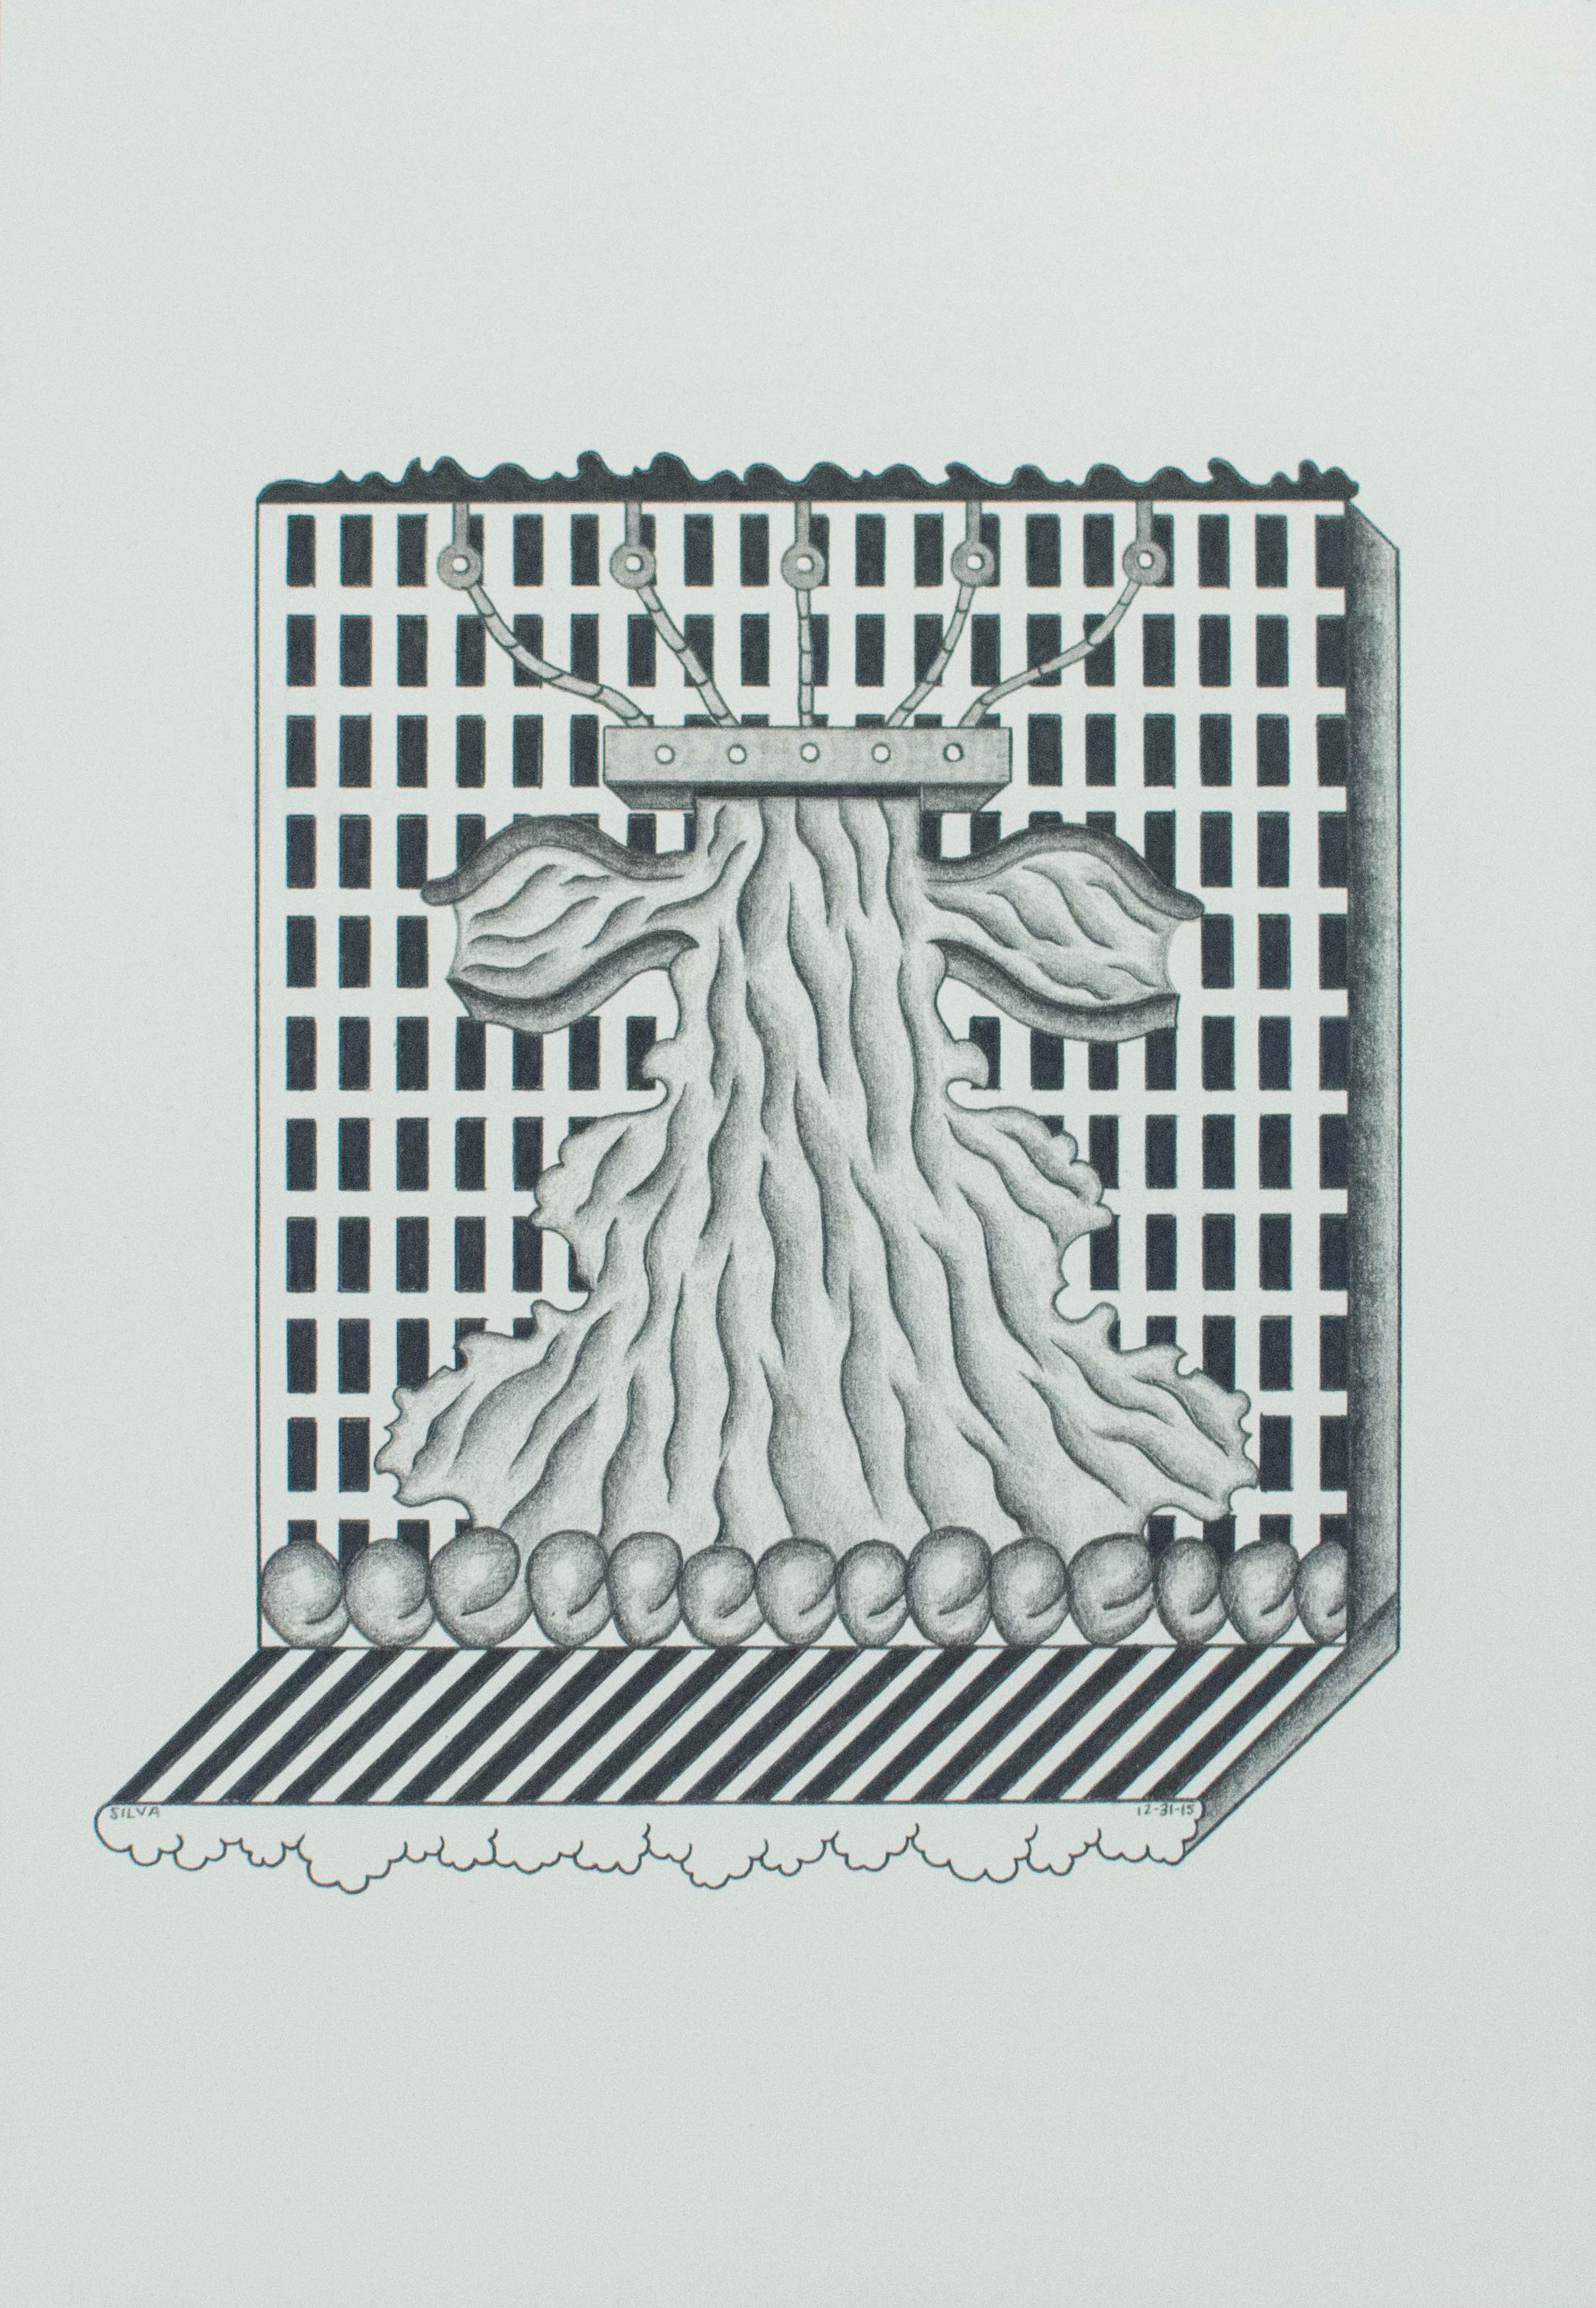 12-31-15, 2015, Graphite on paper, 7 x 10 inches